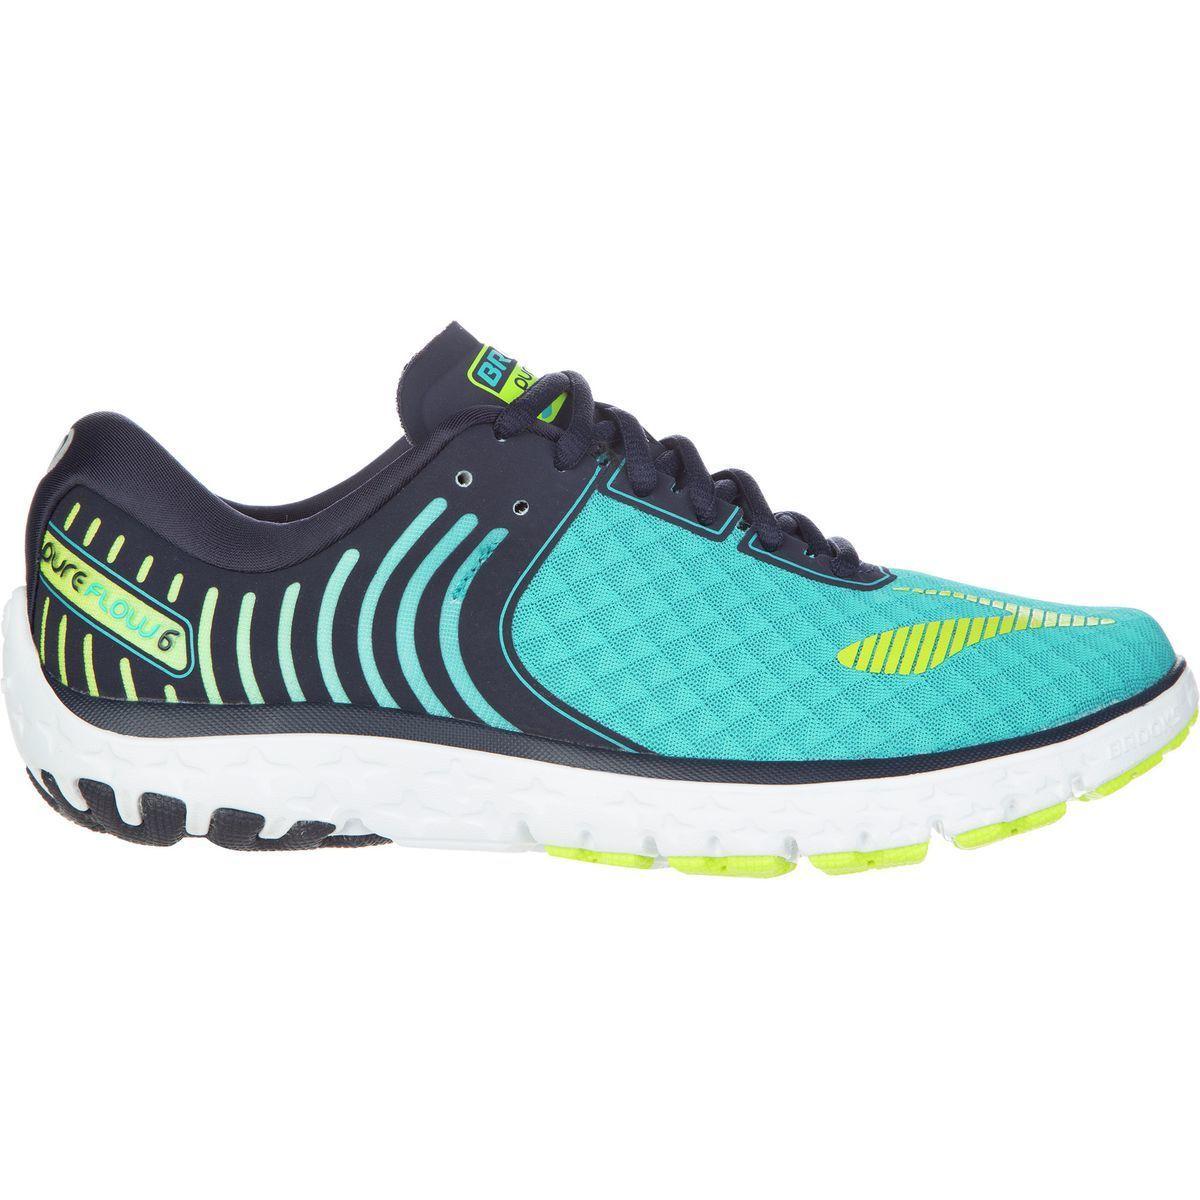 Brooks Pureflow Road Running Shoes